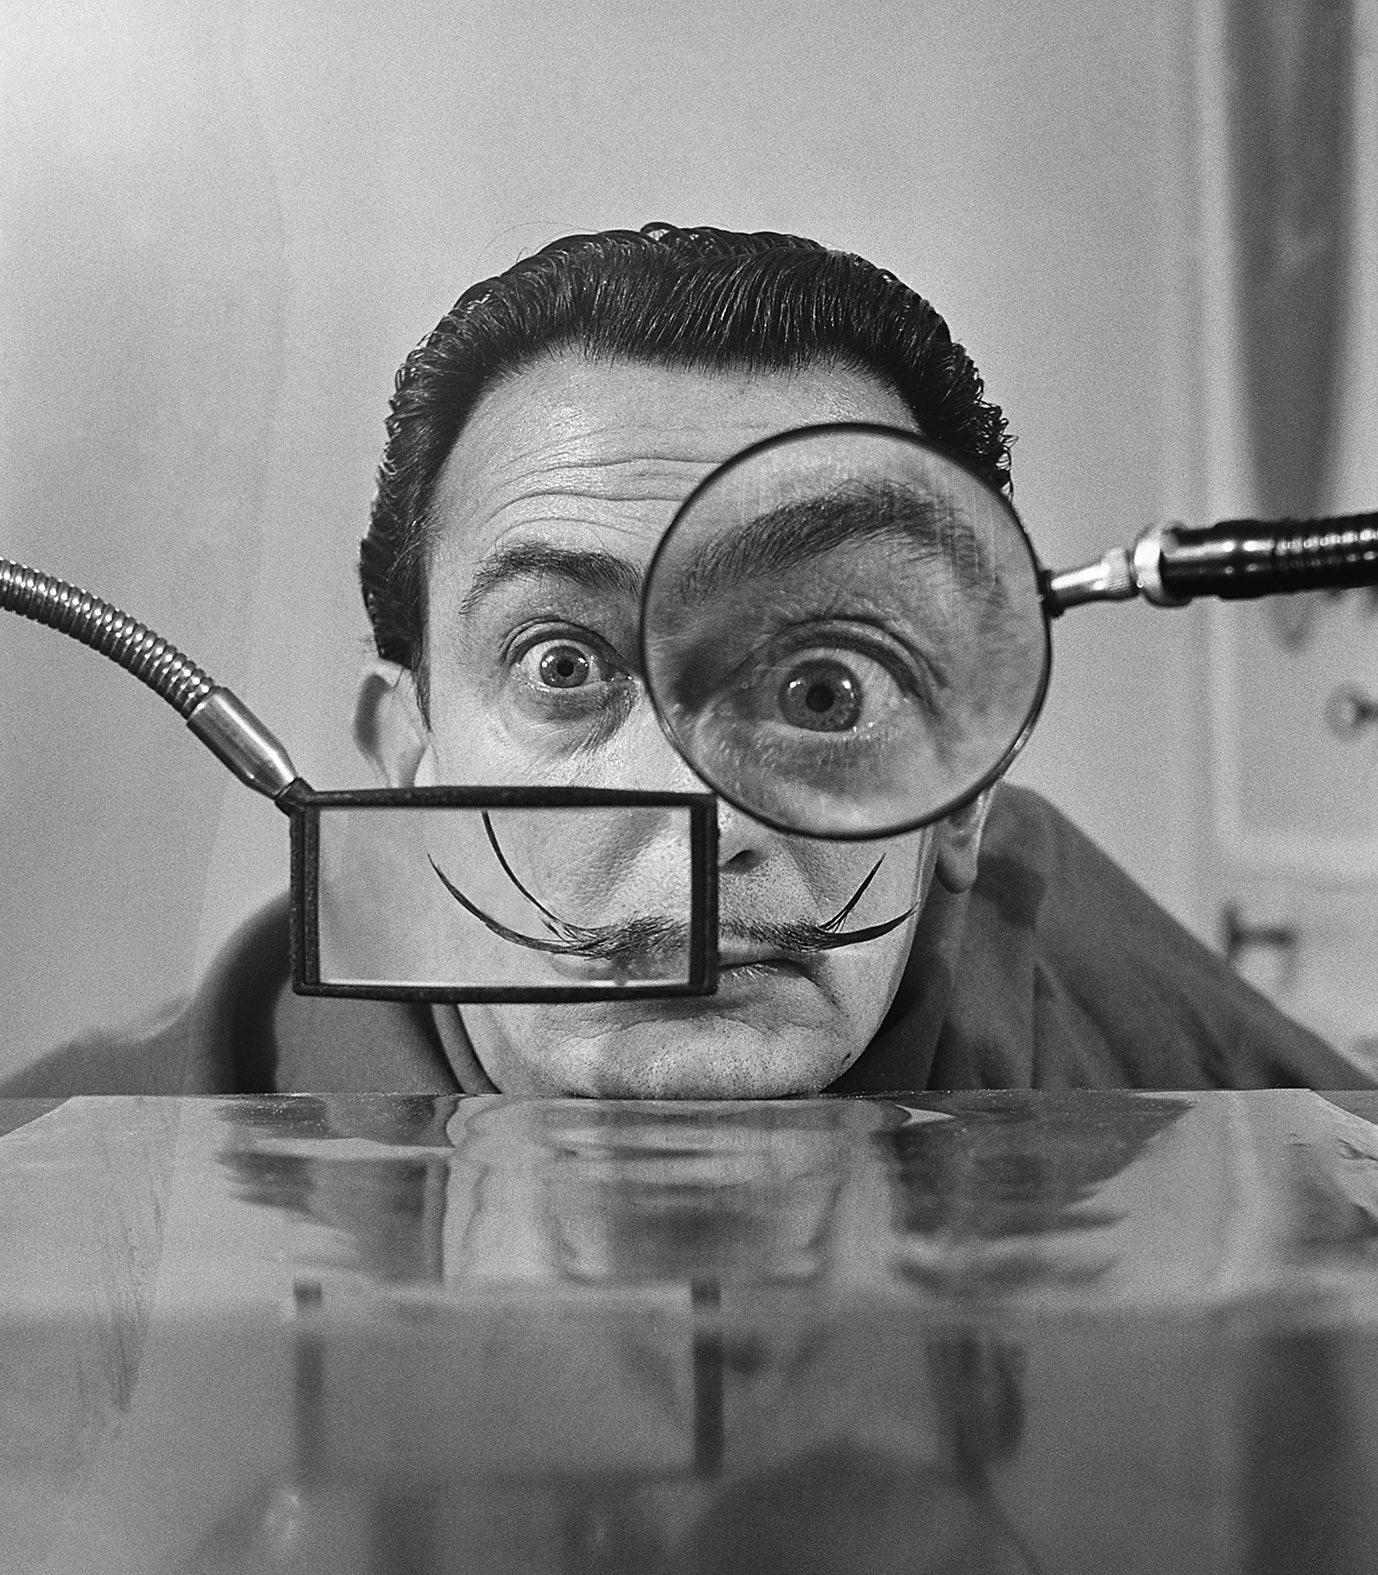 Salvador Dali woth Lenses, Paris, 1949